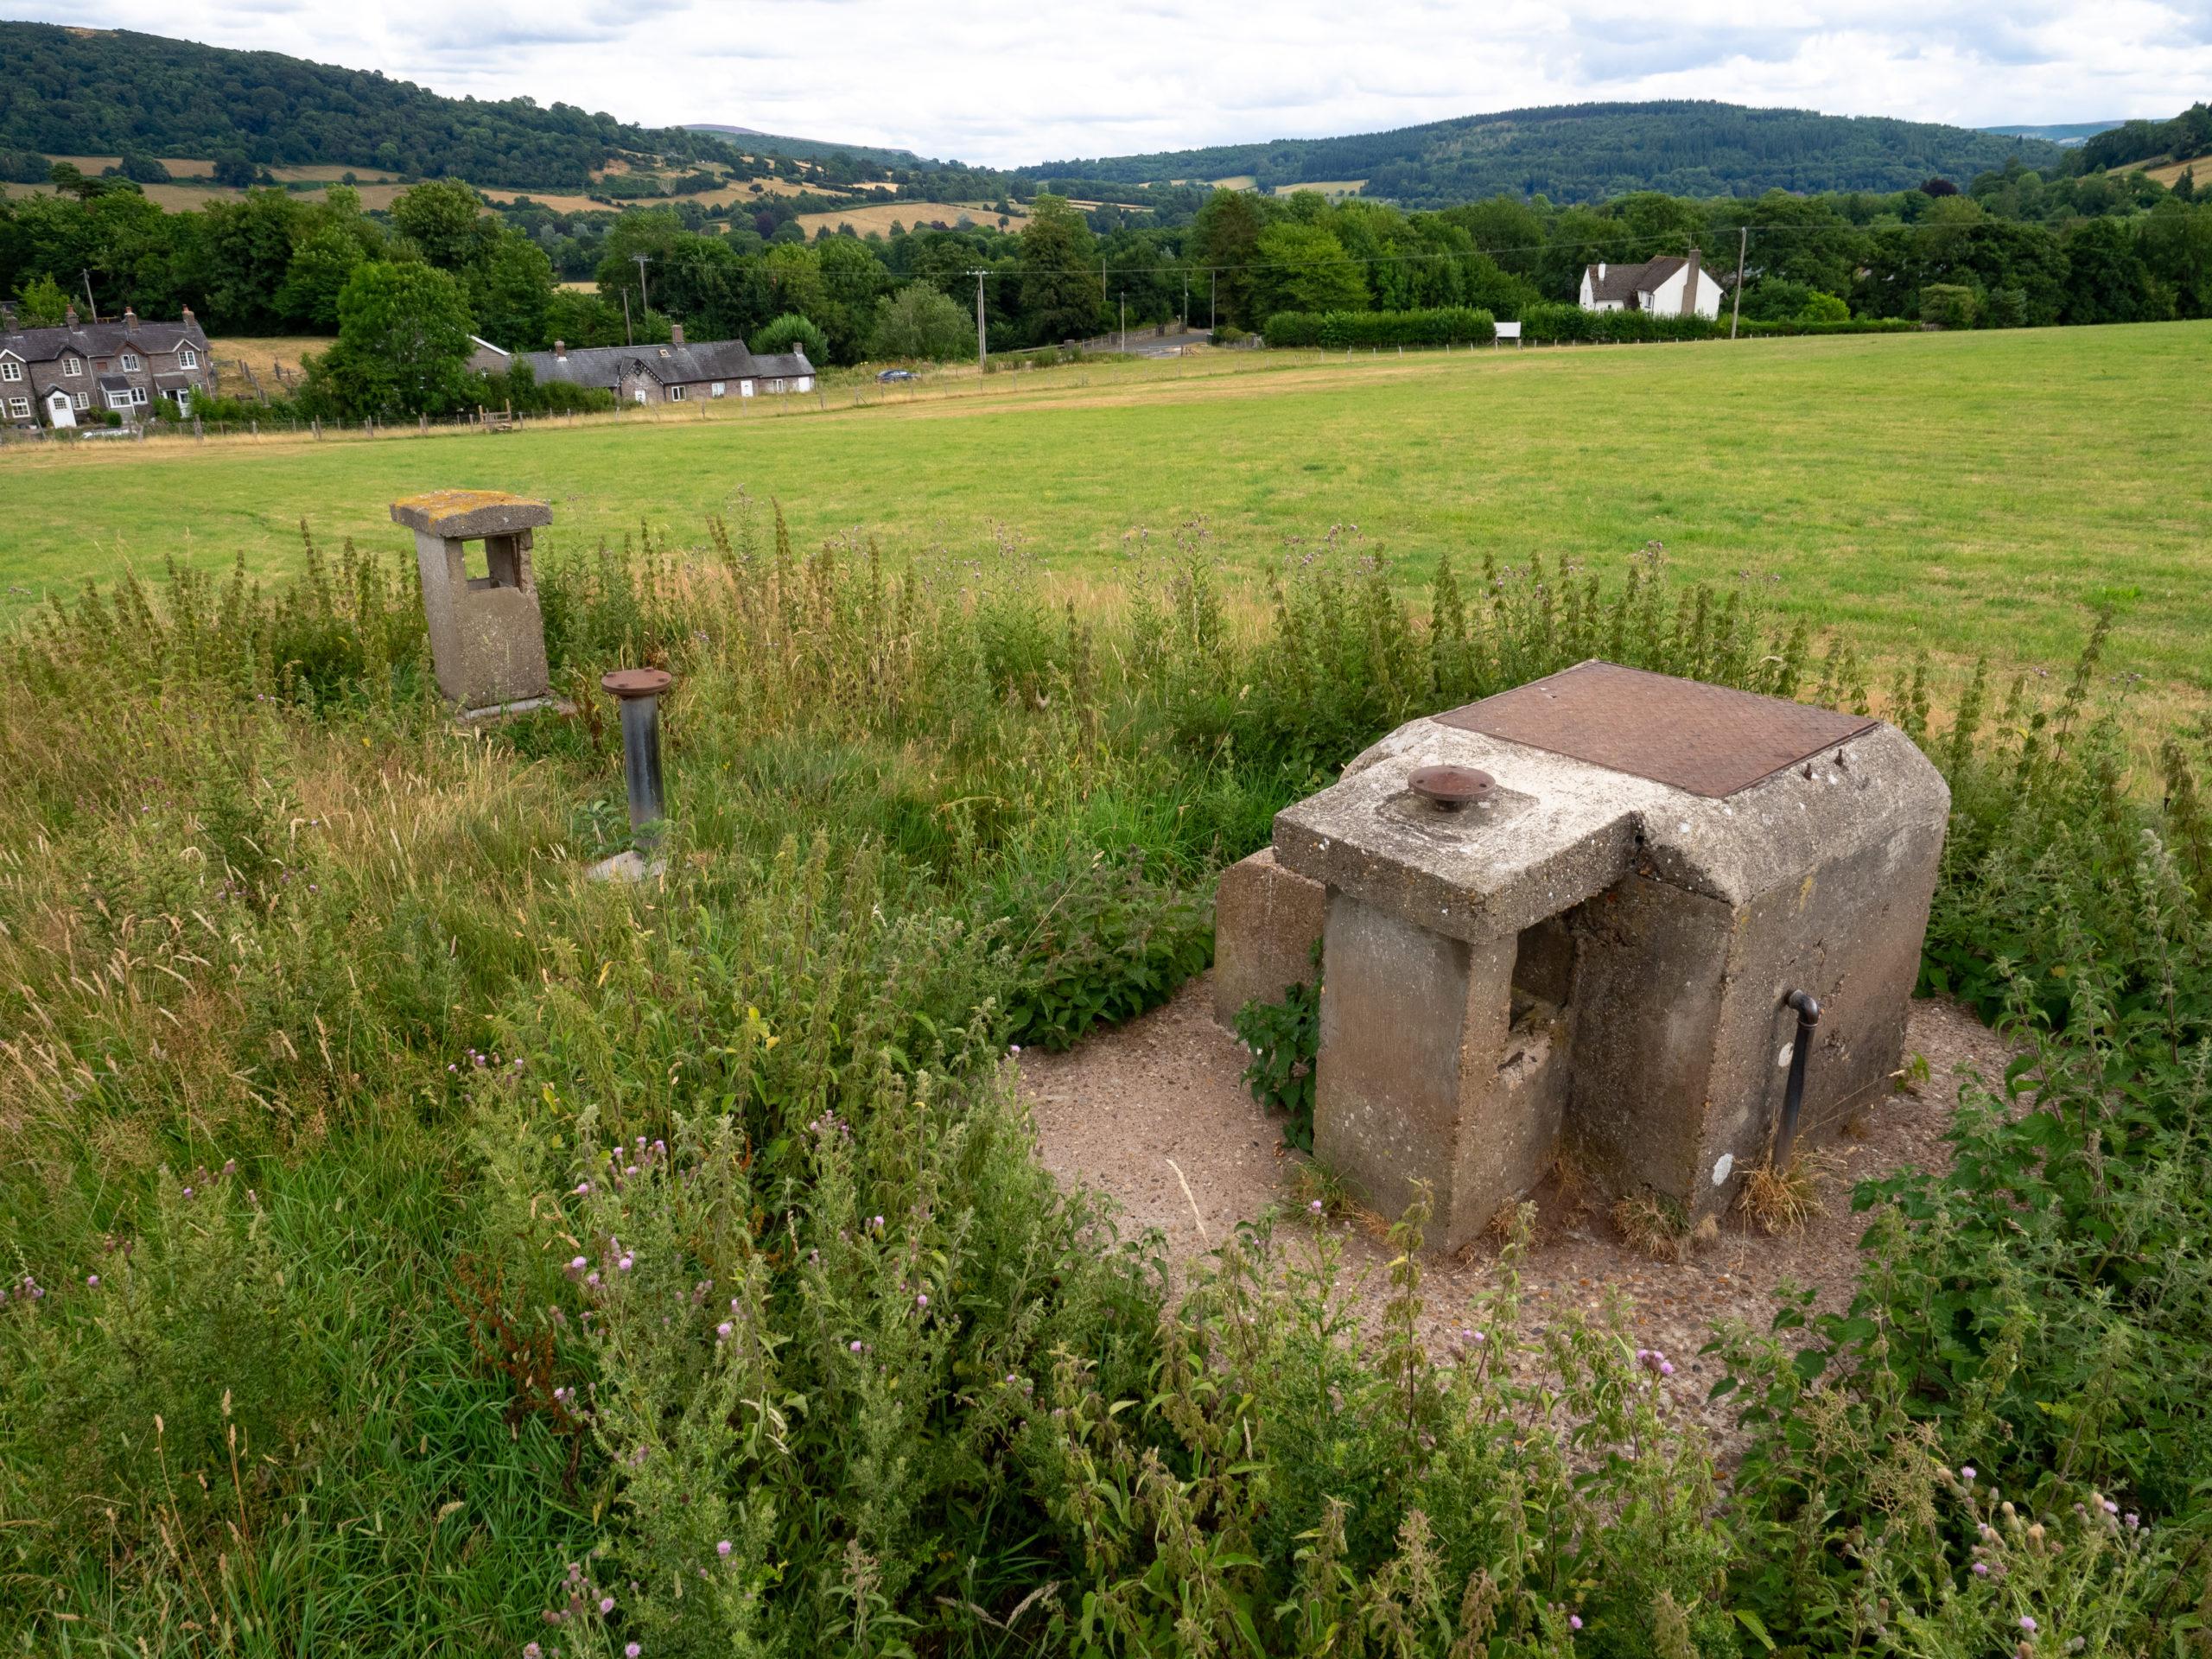 Royal Observer Corps bunker